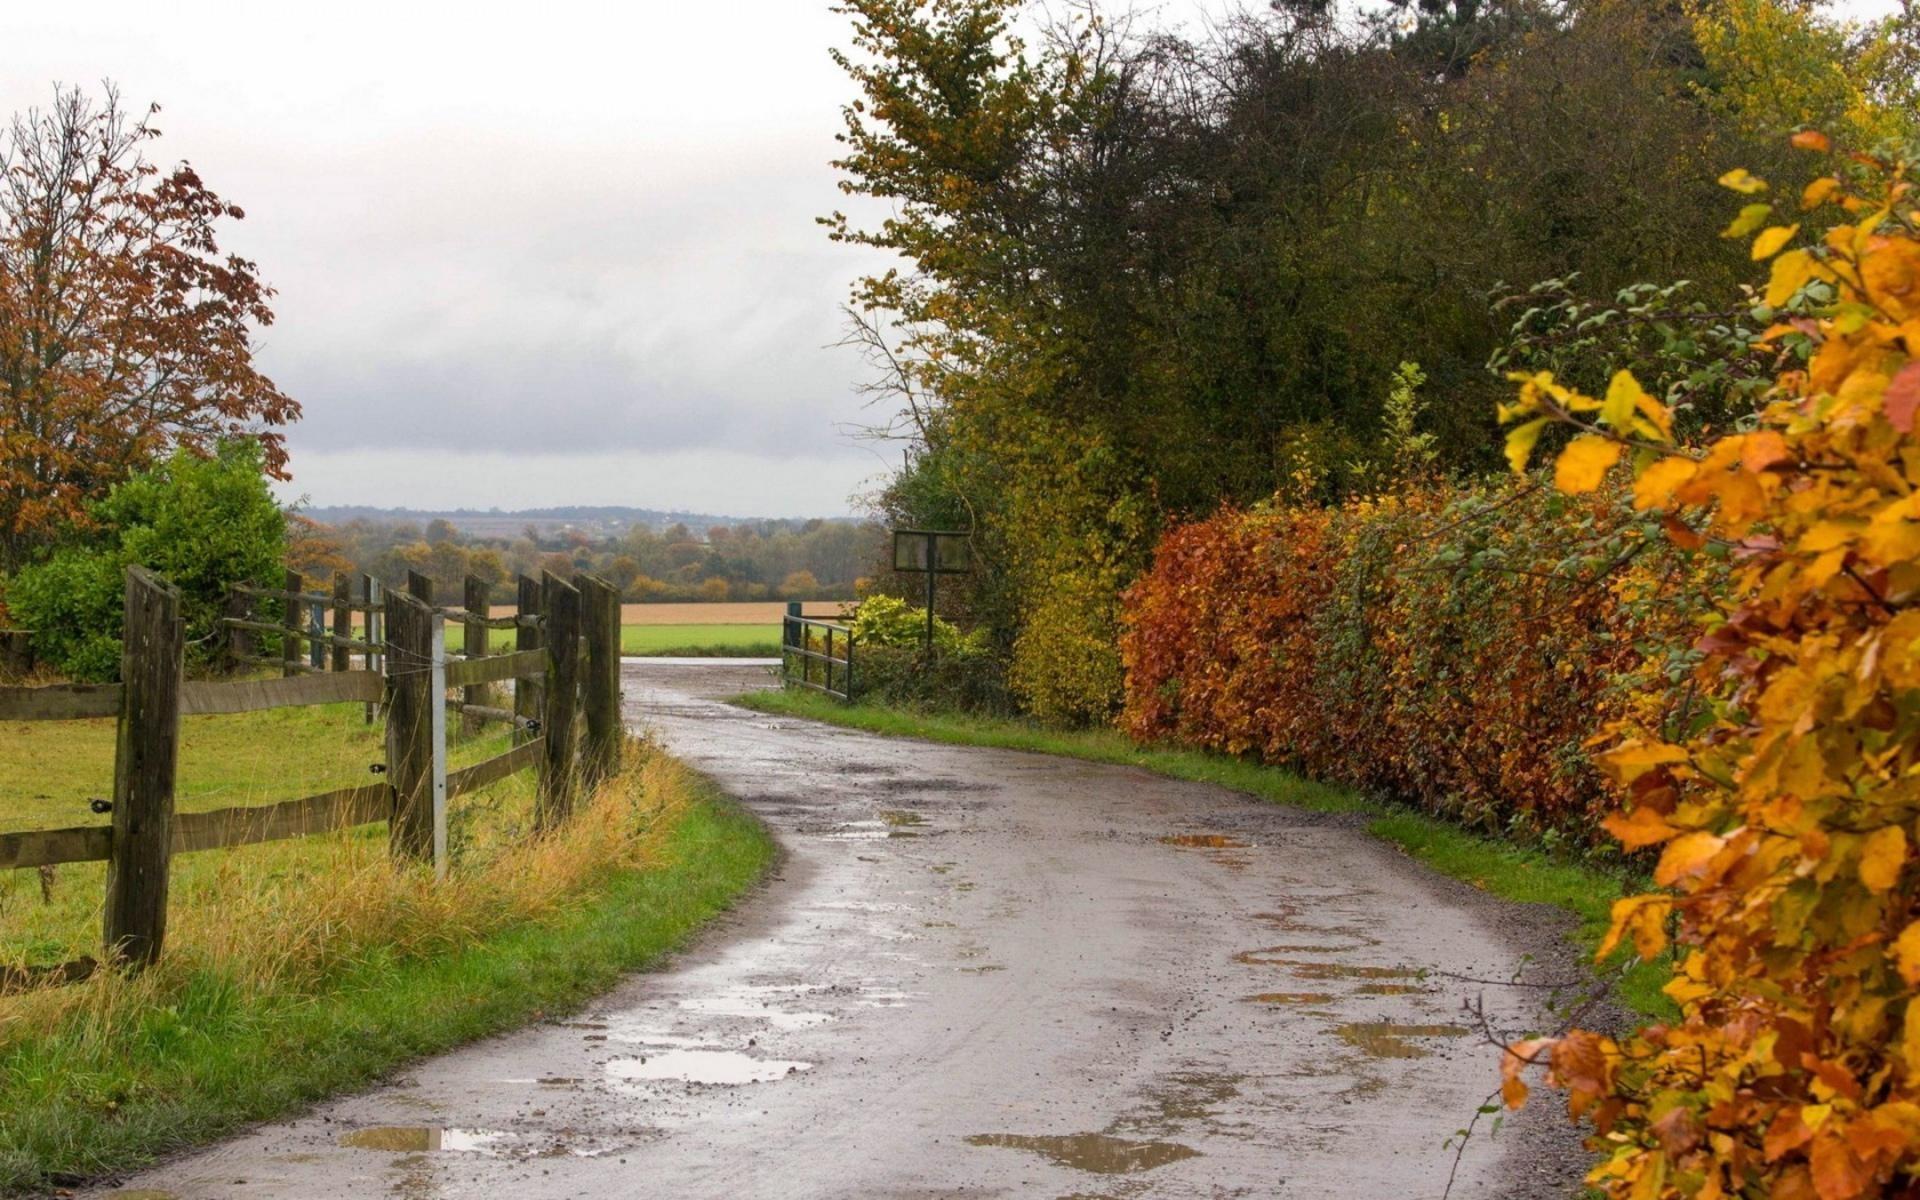 Roads Autumn Fall Rain Wet Water Reflection Fence Landscapes Trees Desktop  Backgrounds